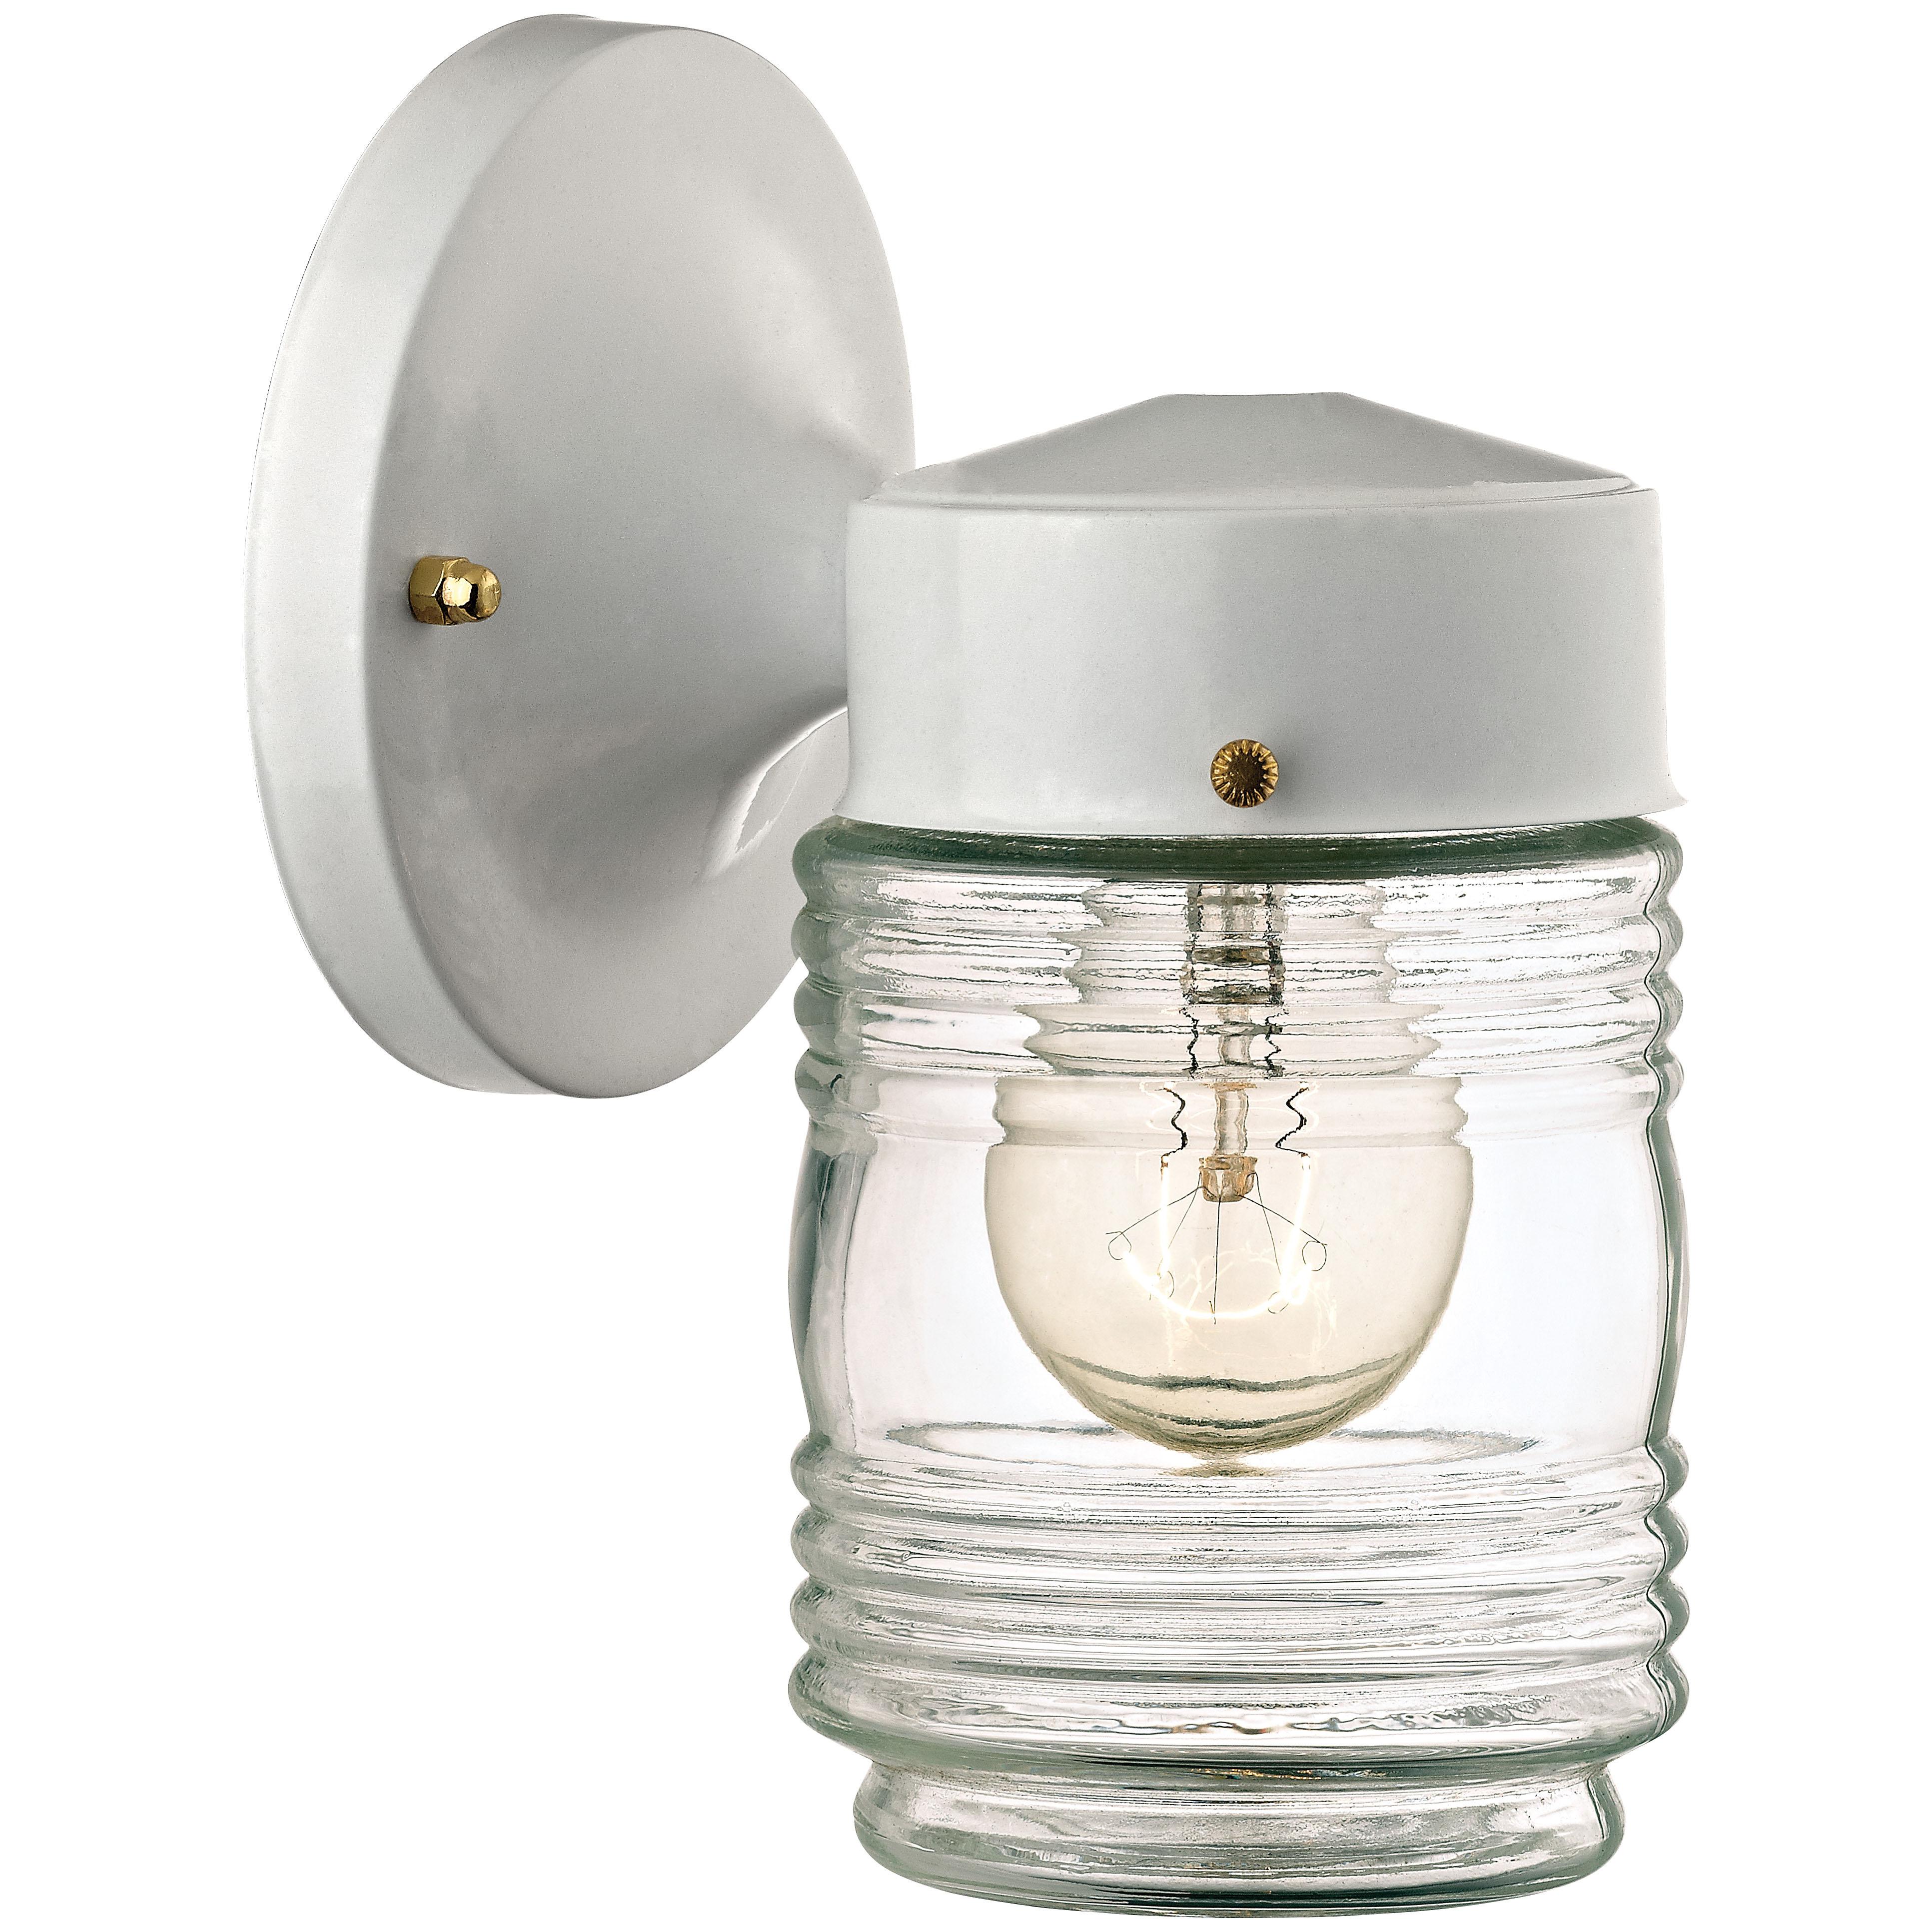 Picture of Boston Harbor W15WH01-33883L Porch Light Fixture, CFL Lamp, White